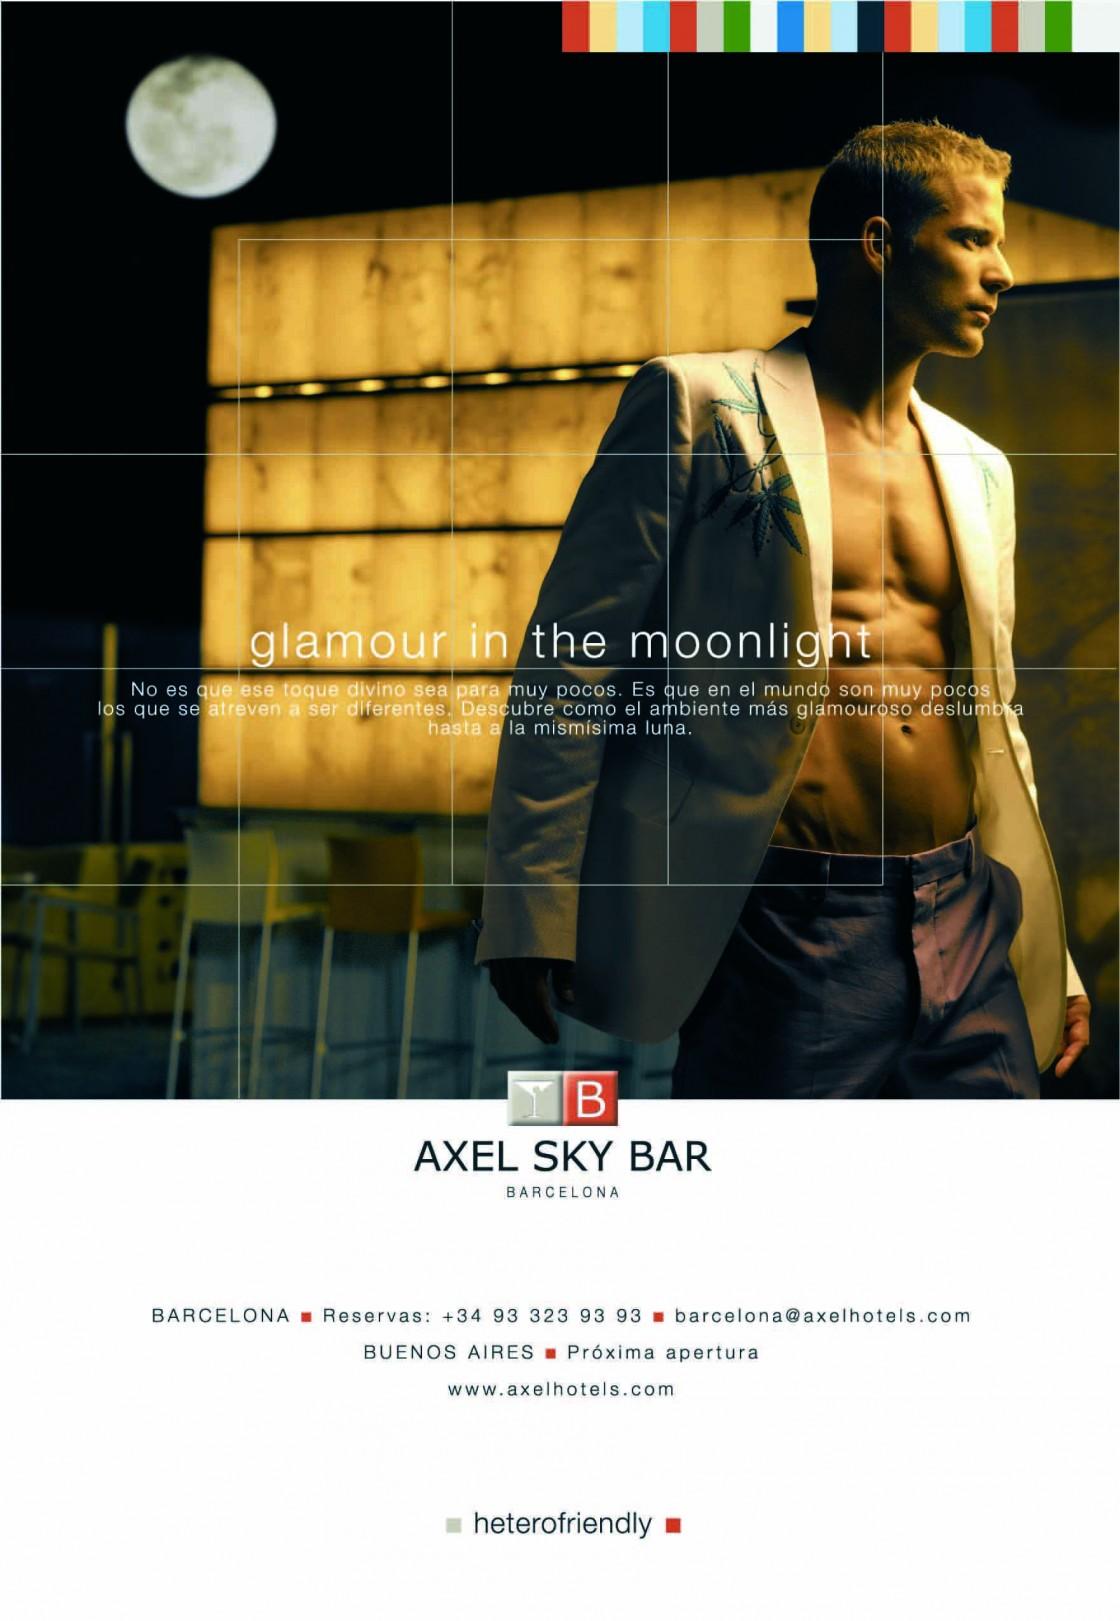 Axel Sky Bar